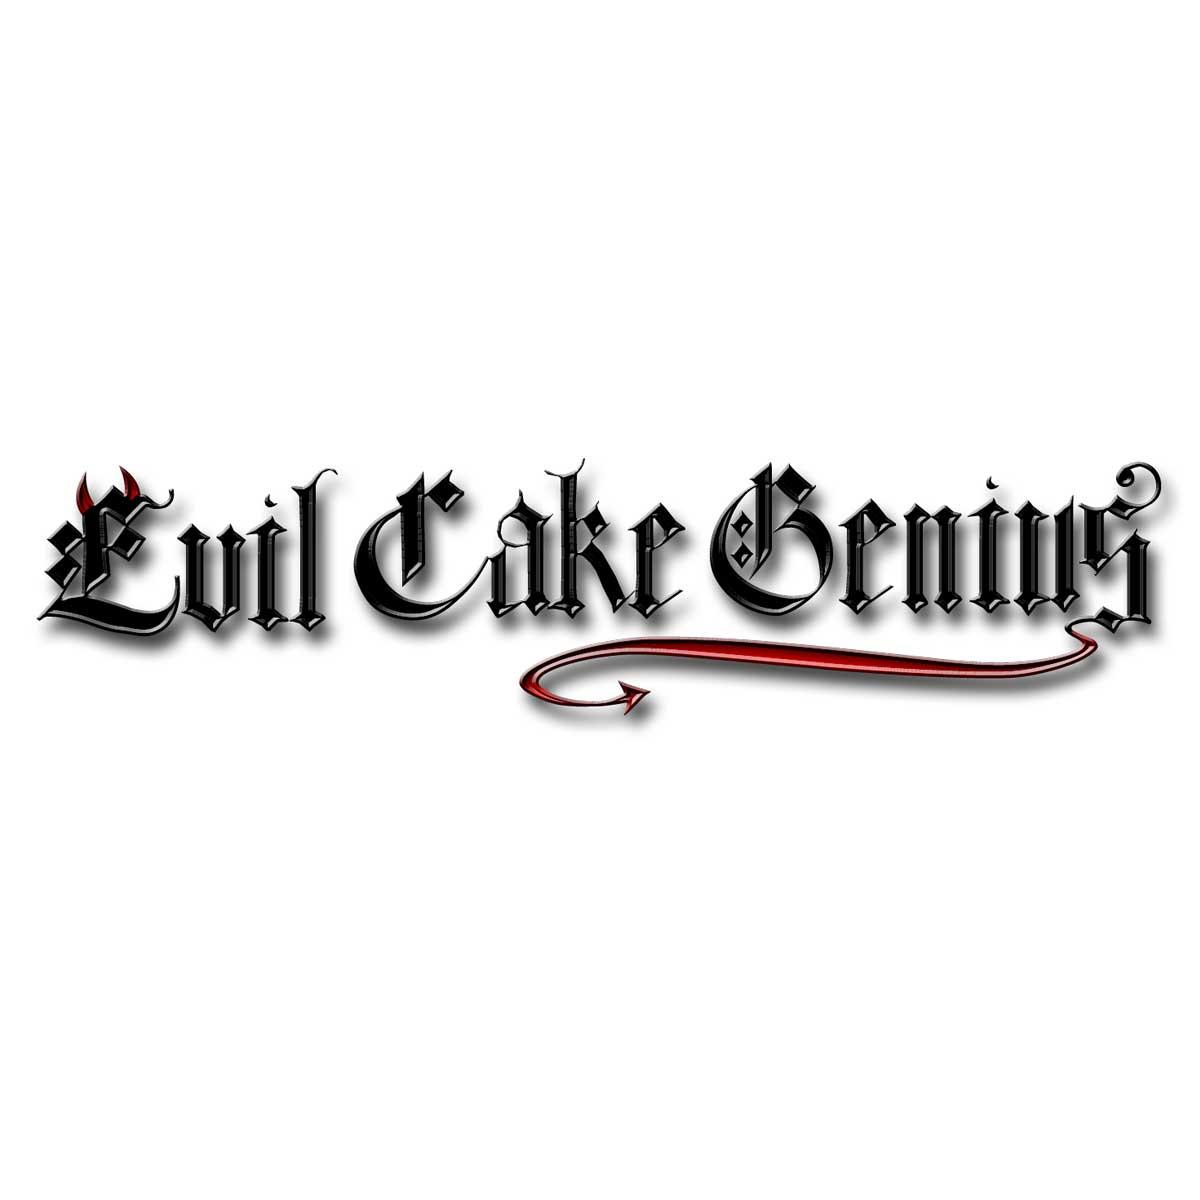 Cartoon Alphabet Mesh Stencil Set Evil Cake Genius